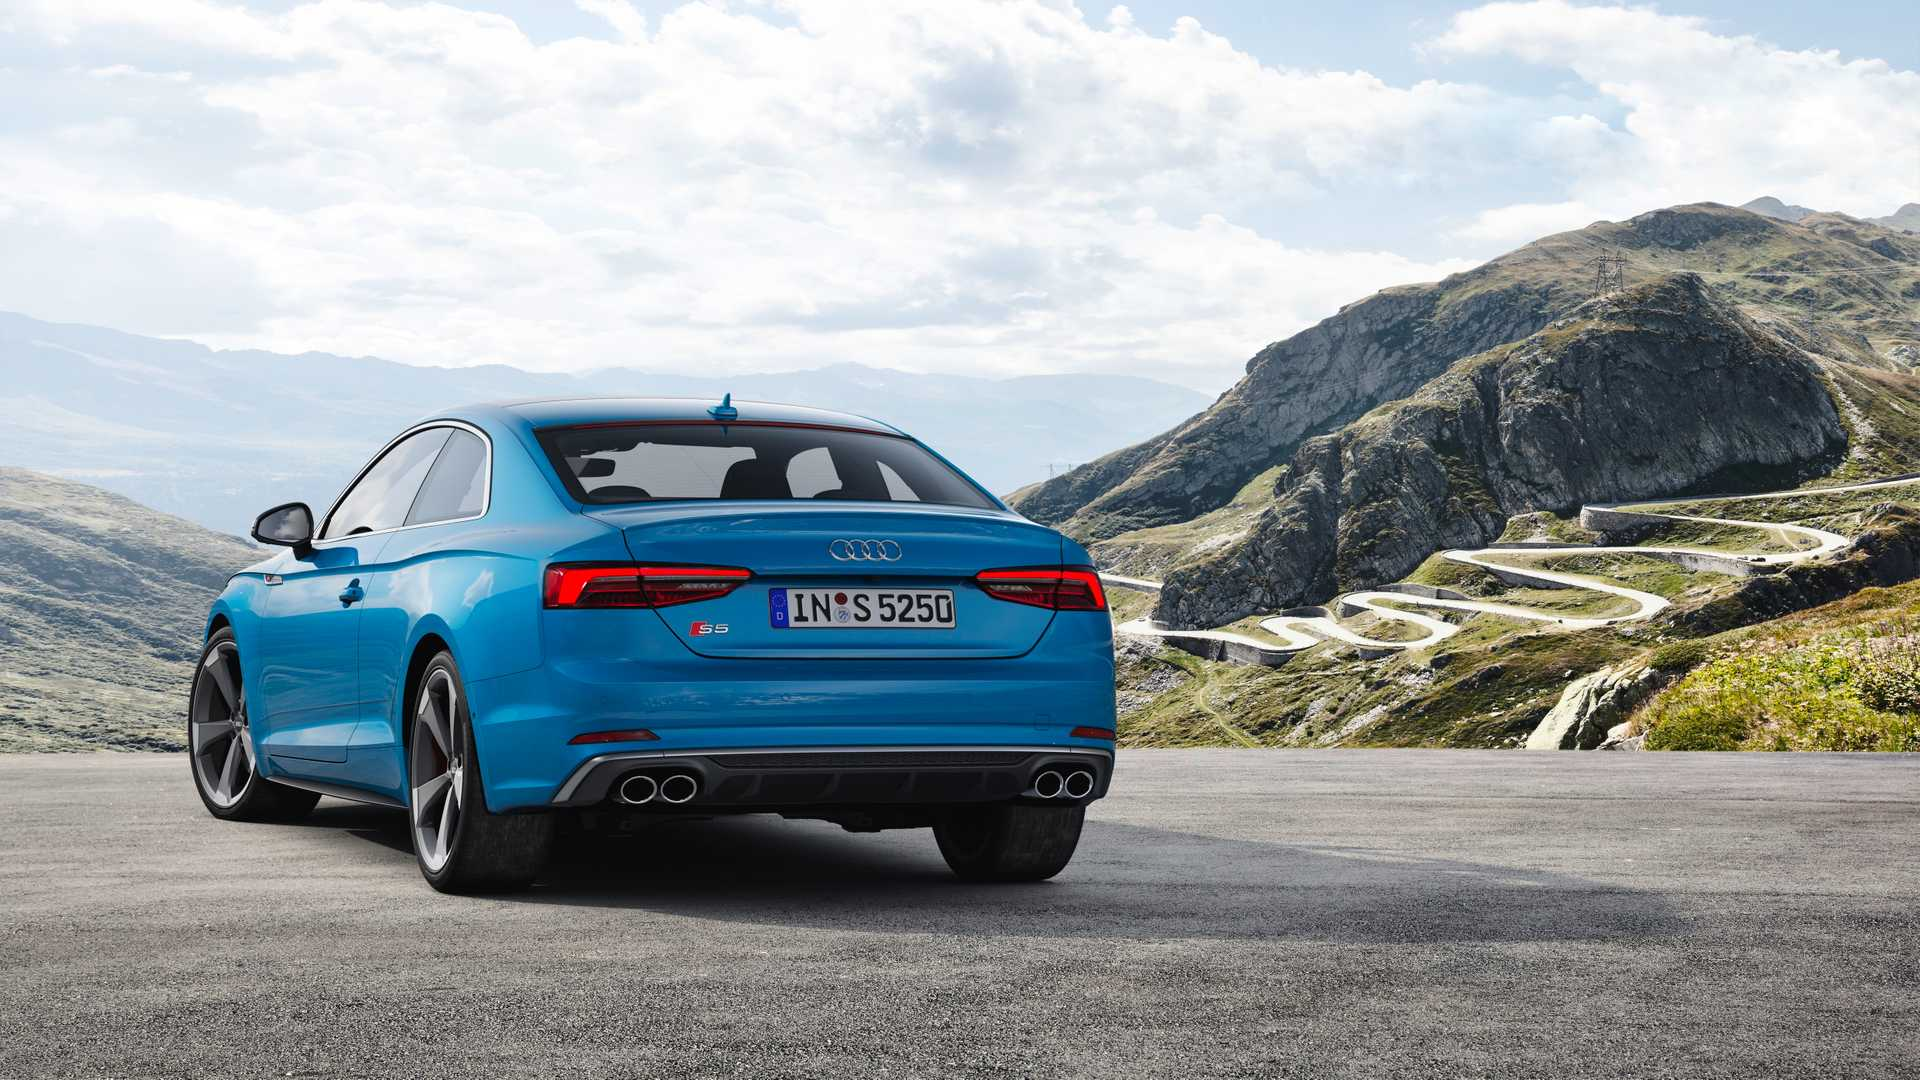 2019 Audi S5 Coupé TDI Rear Wallpapers #10 of 17